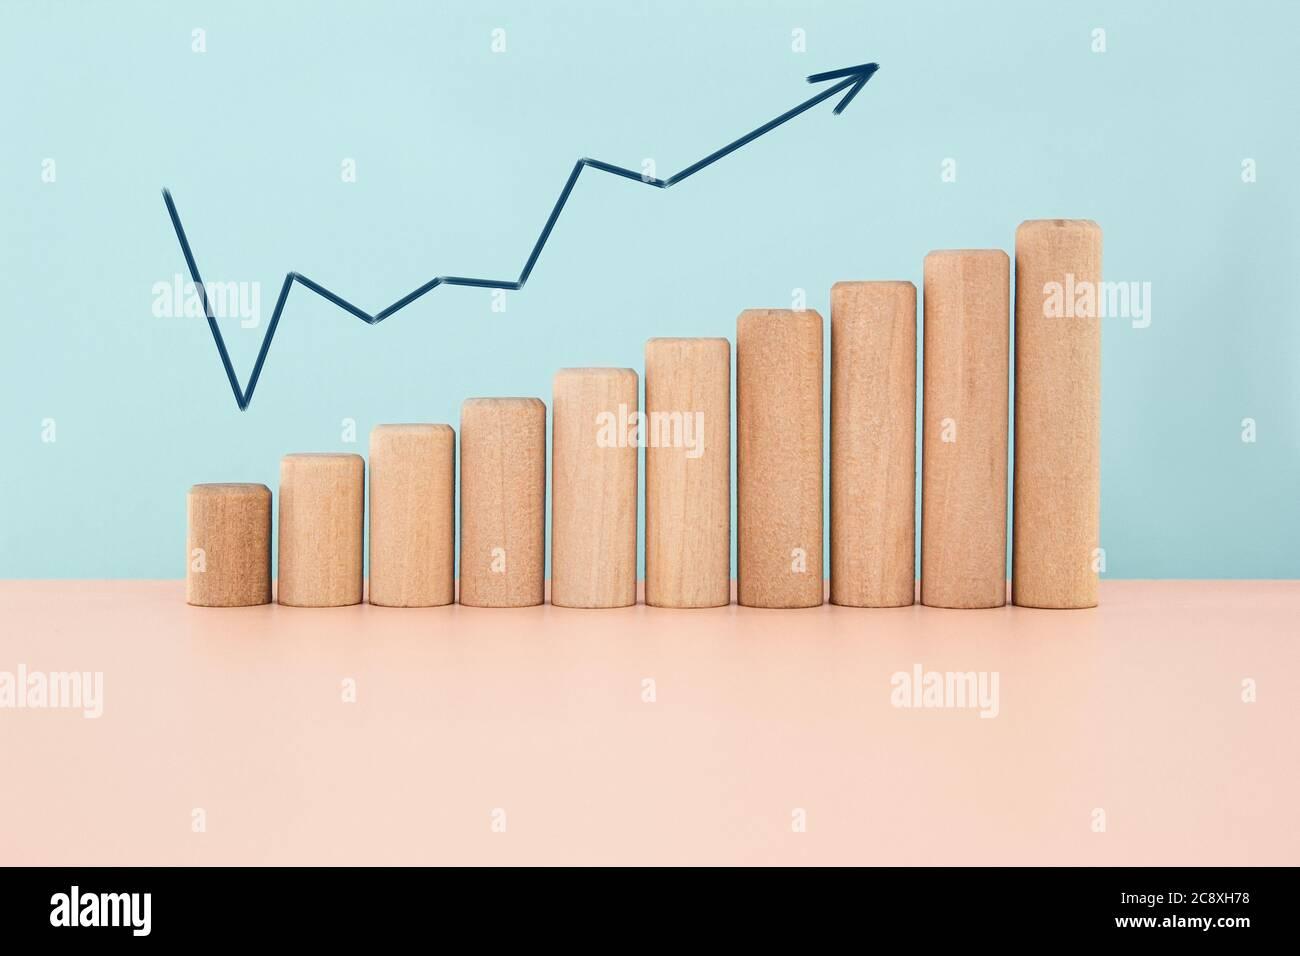 Concepto de crecimiento empresarial sobre fondo azul. Cuadro de aumento de bloque de madera. Foto de stock